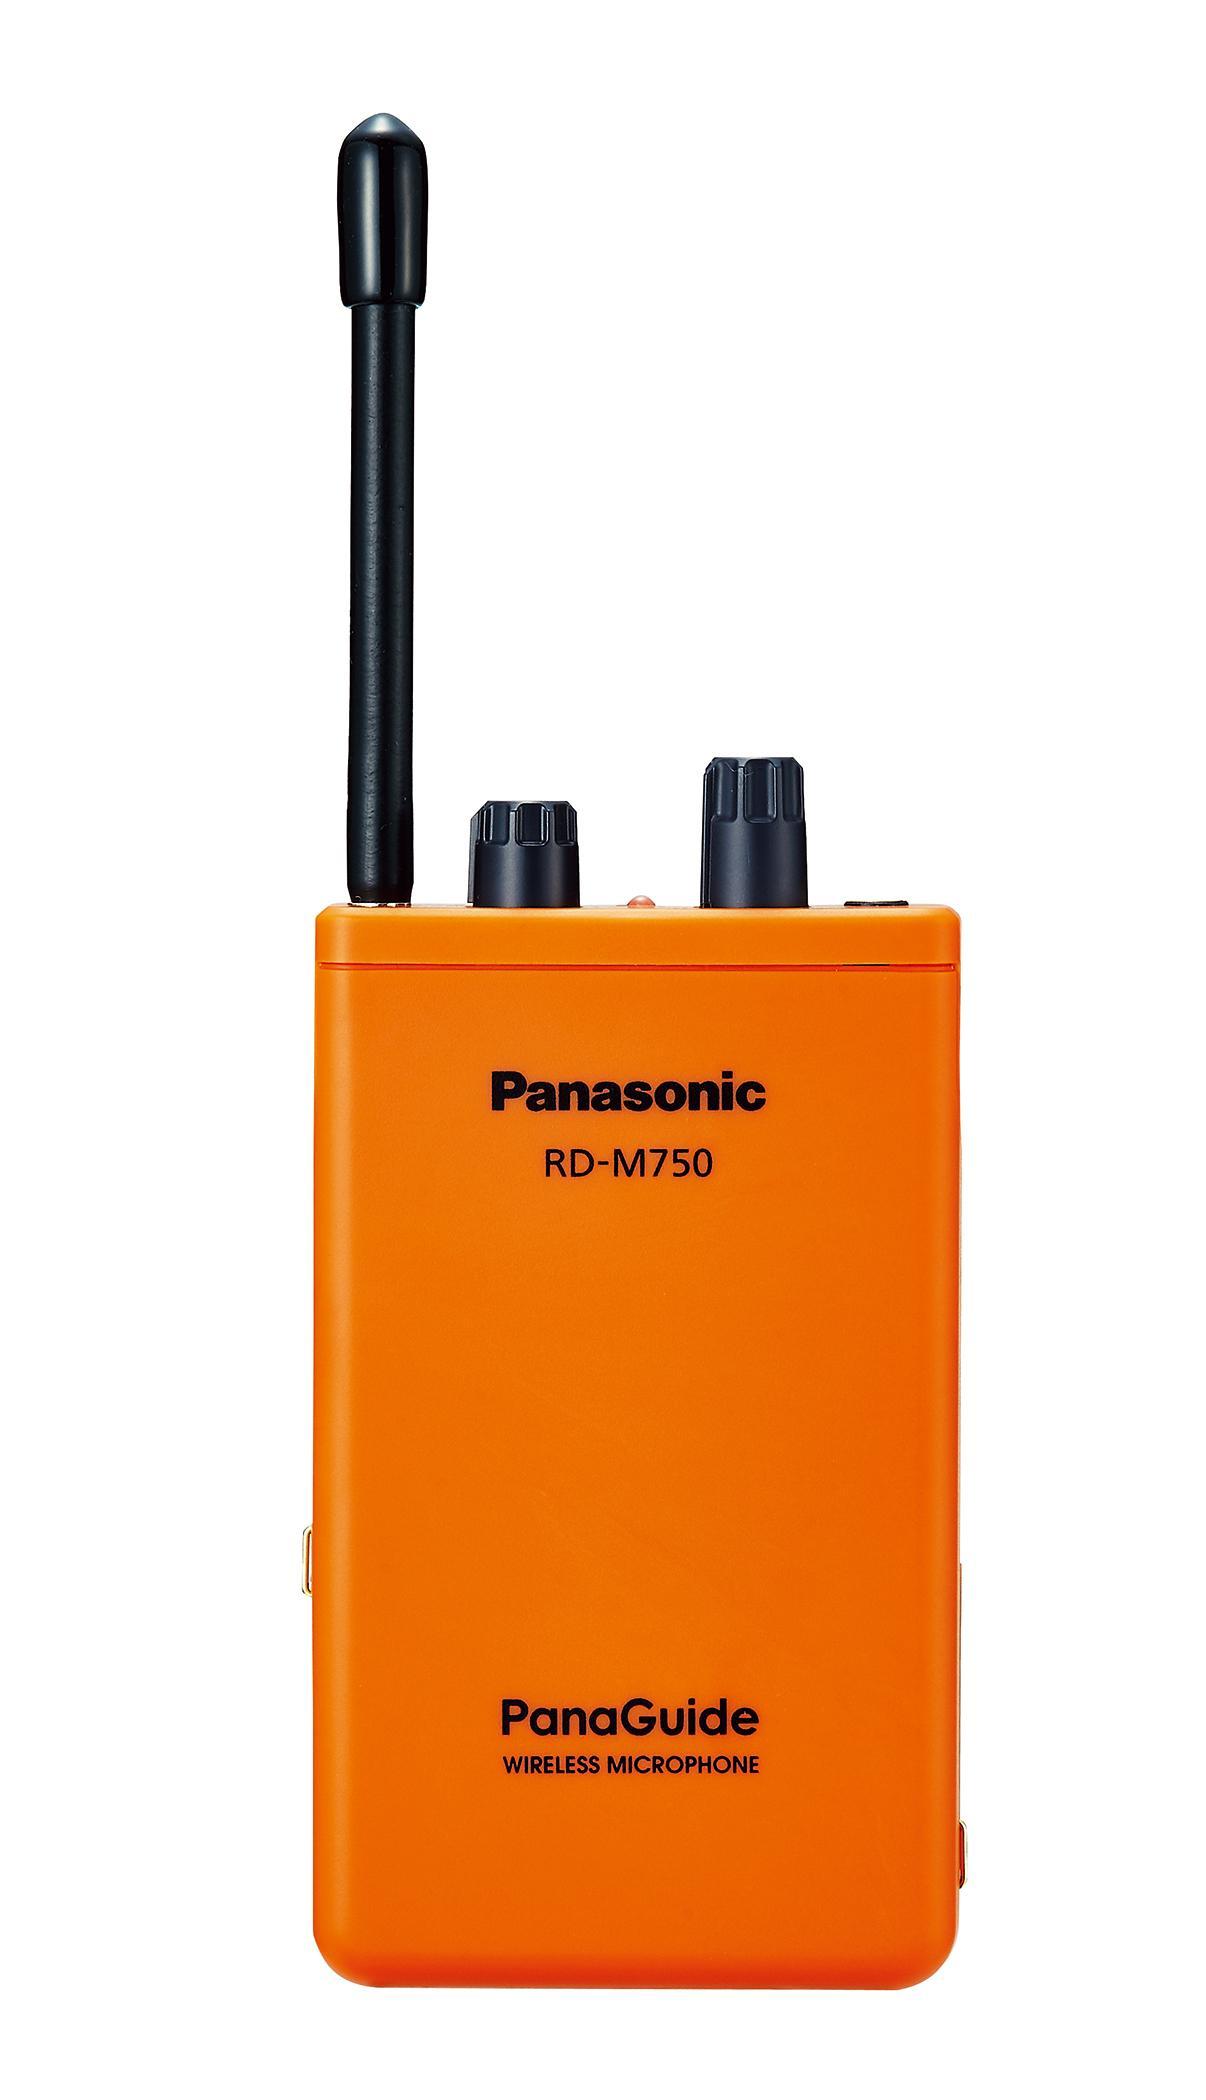 RD-M750